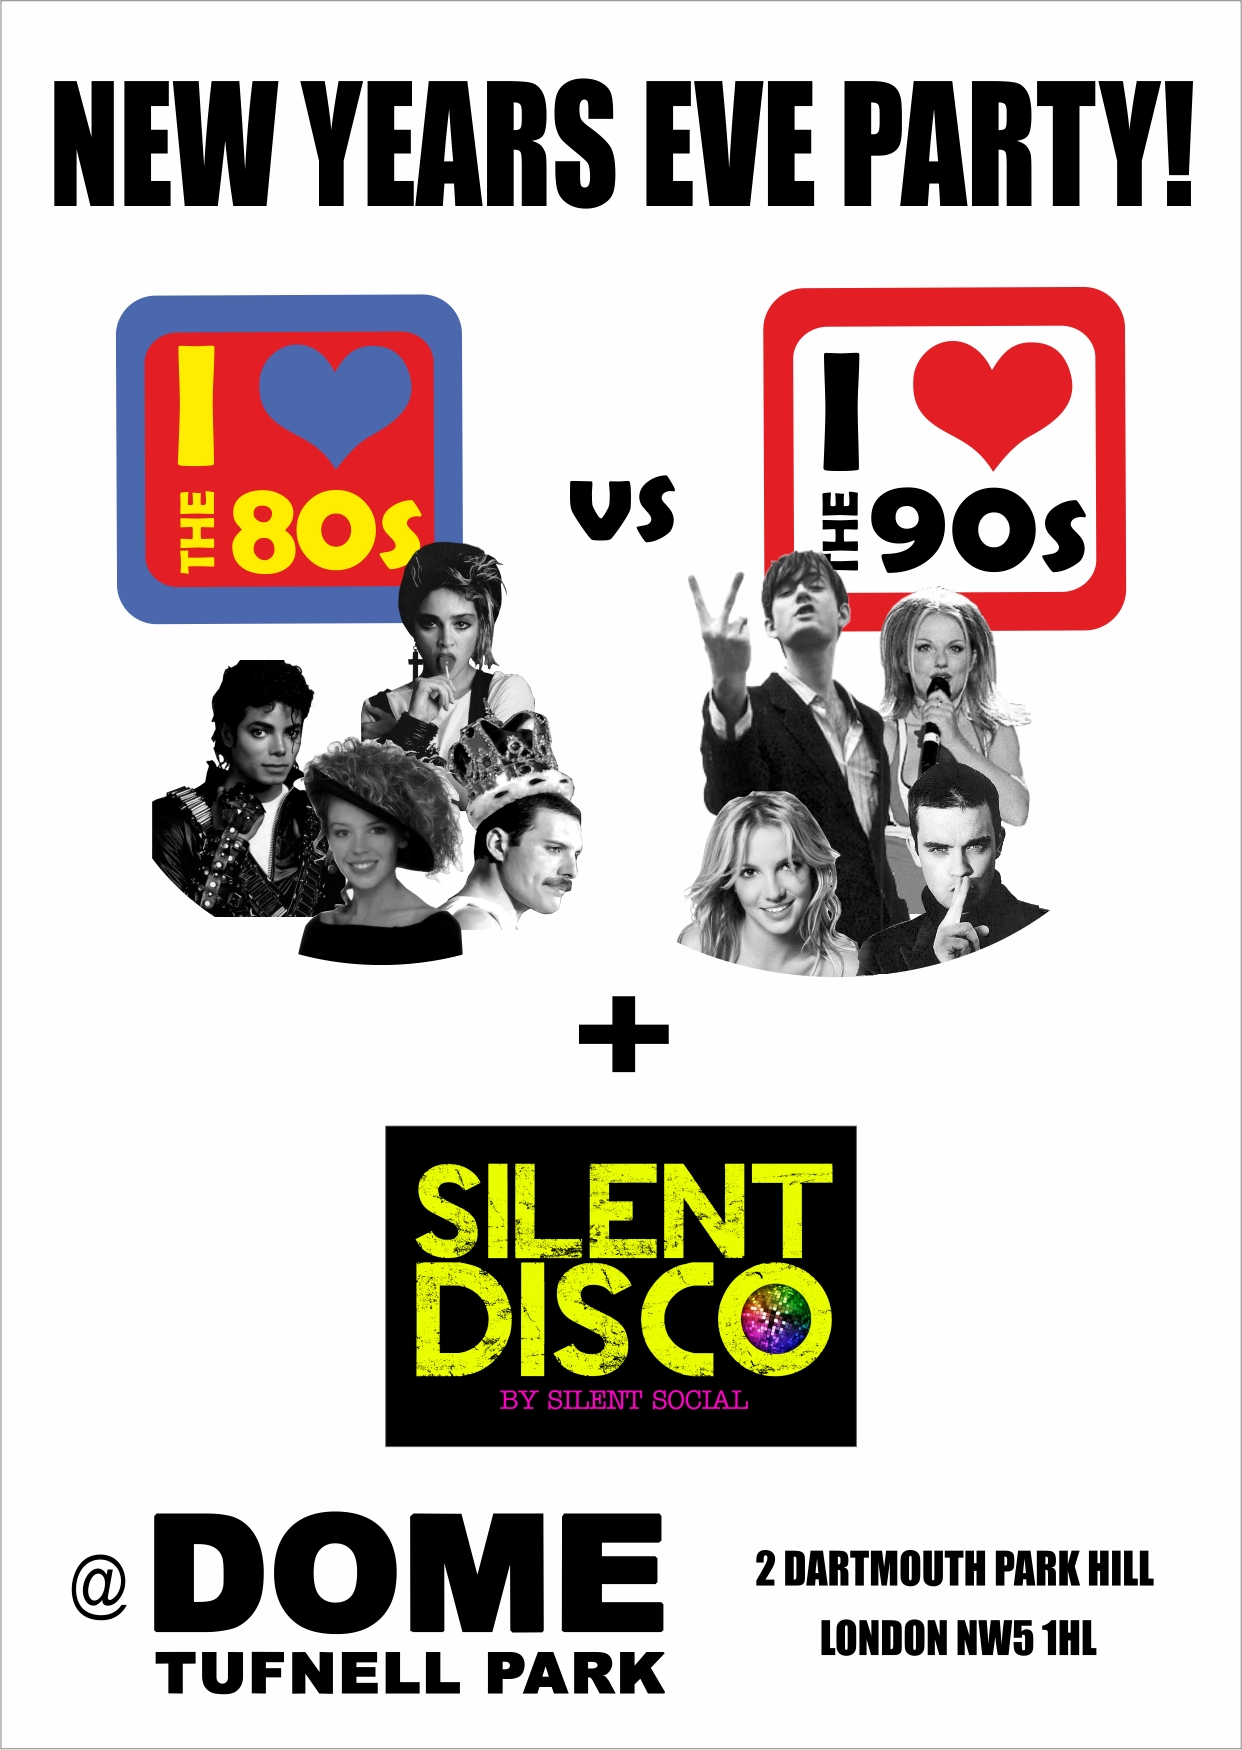 80s vs 90s vs Silent Disco - New Years Eve